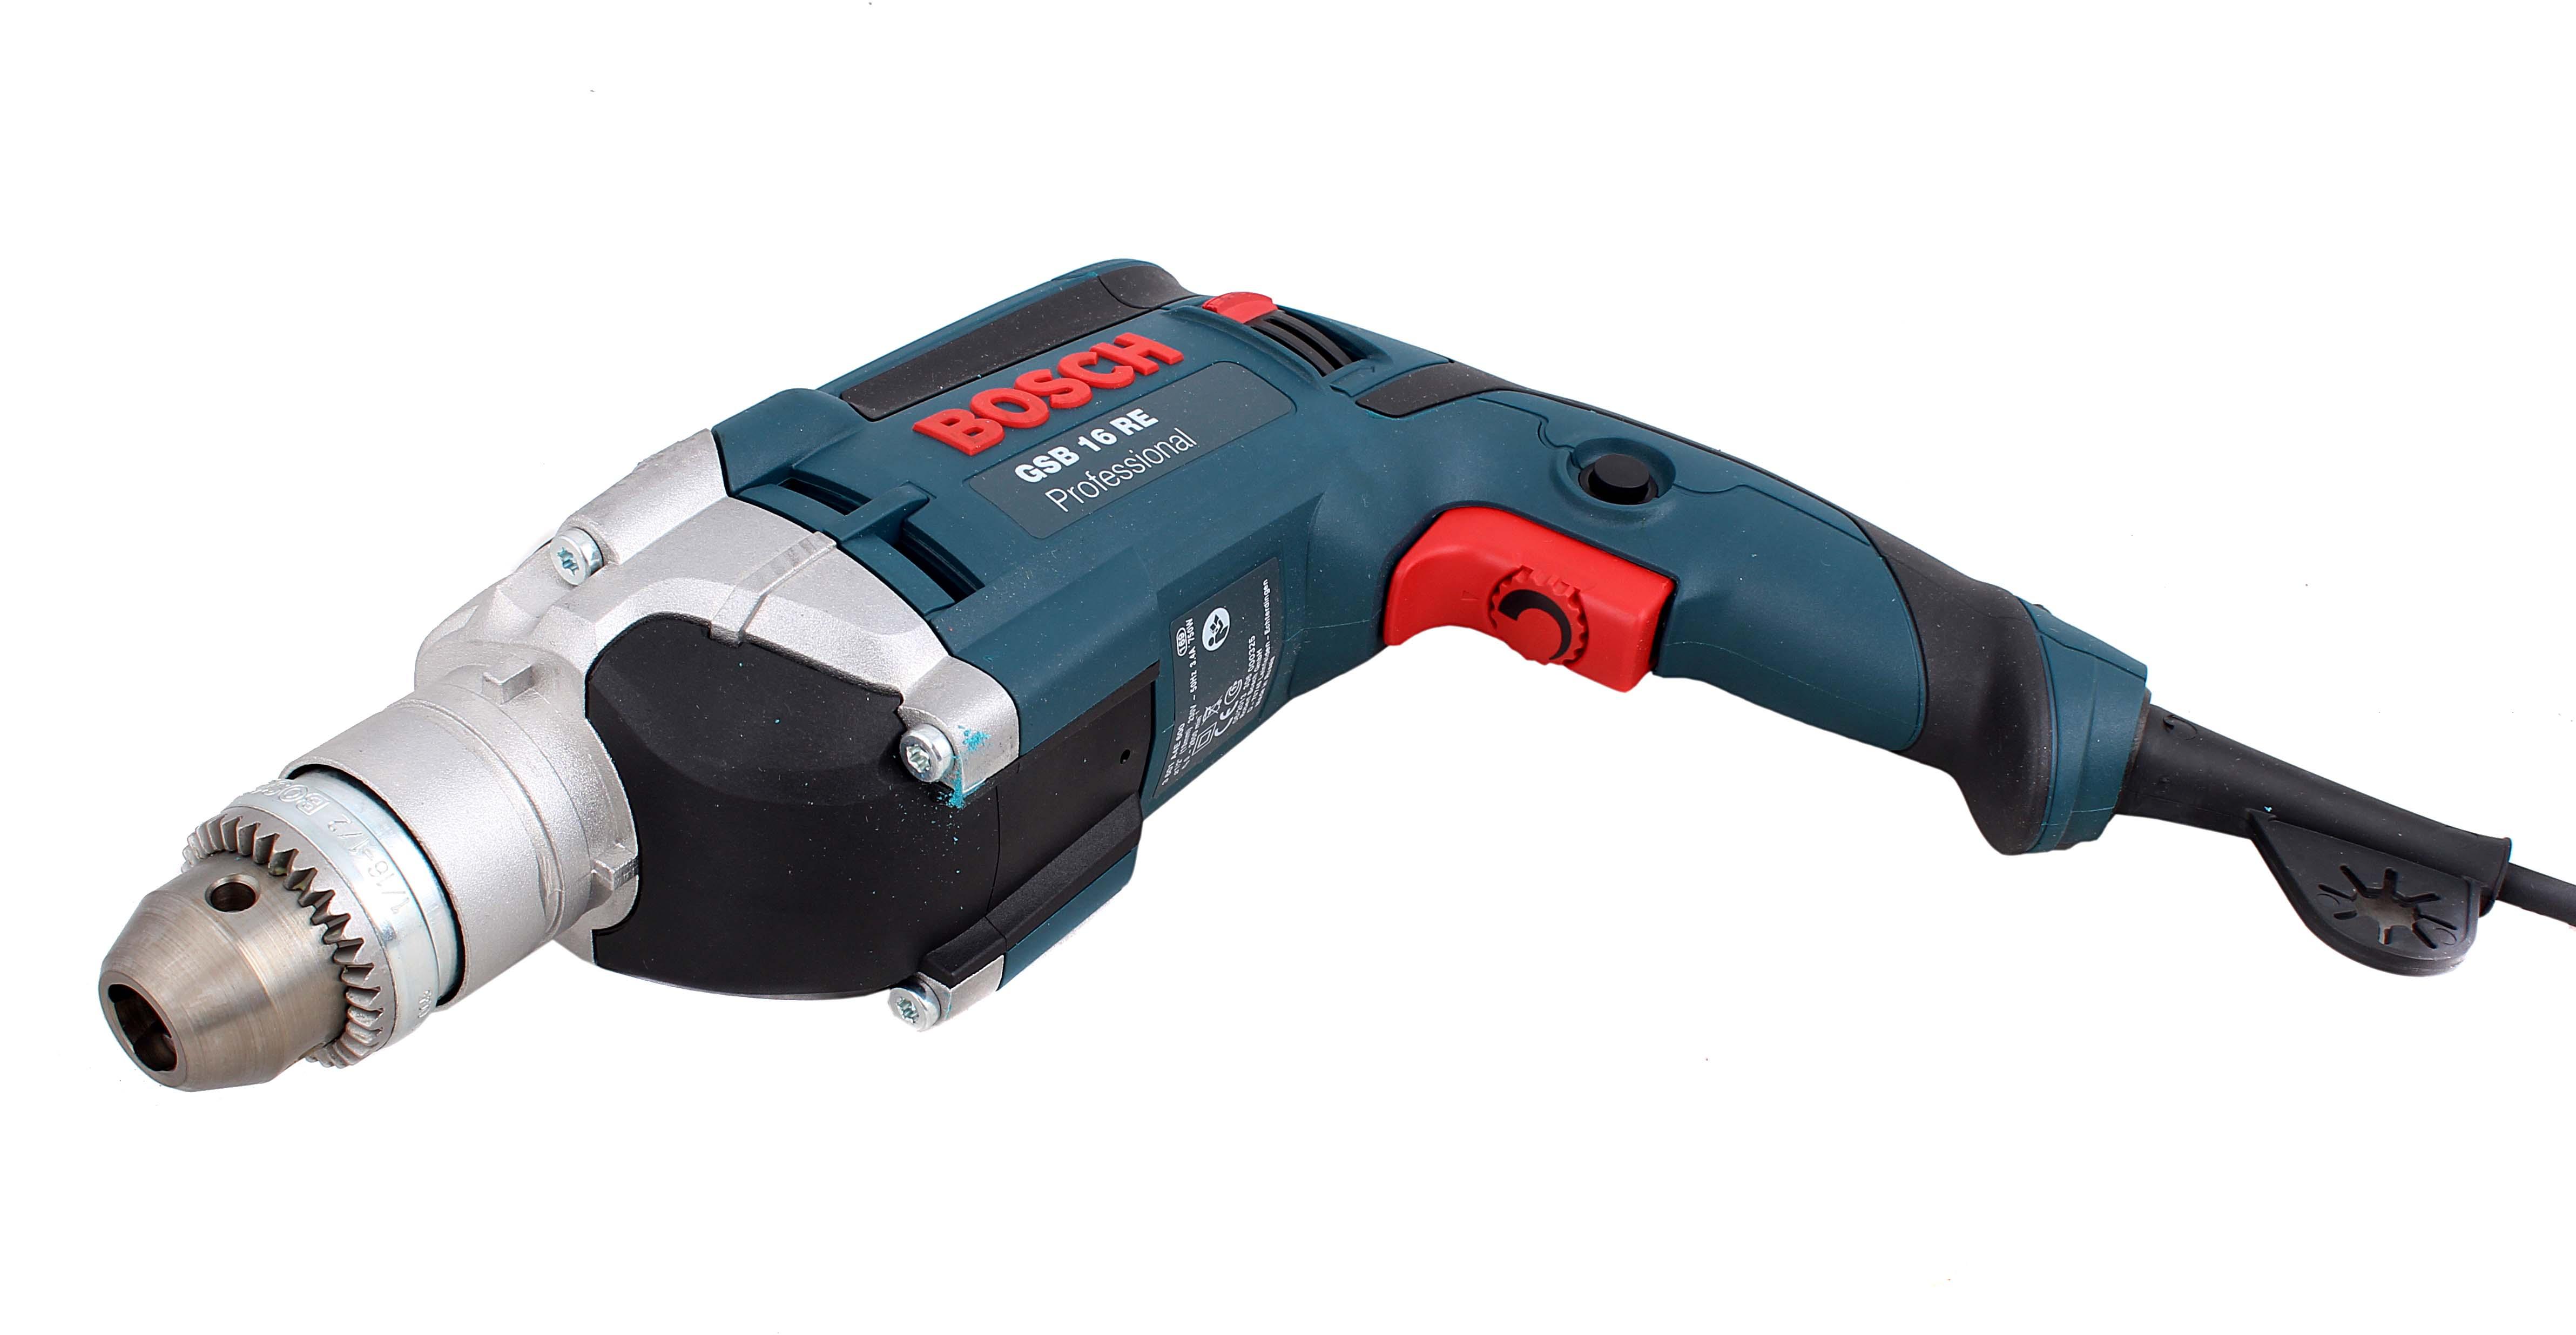 Ударная дрель Bosch Real Brand Technics 5830.000